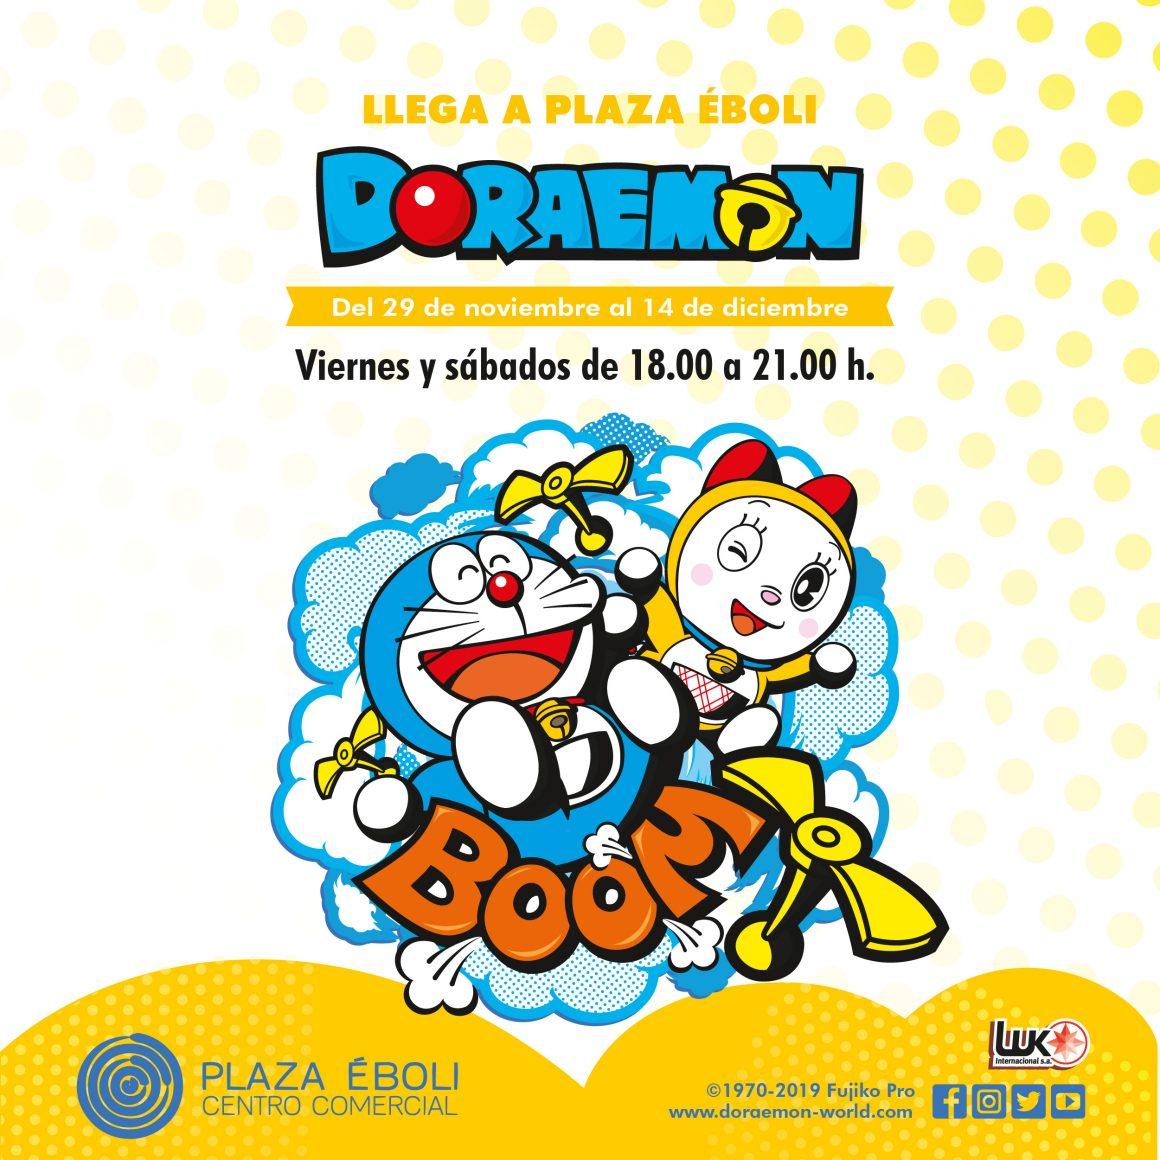 Doraemon llega a Plaza Éboli